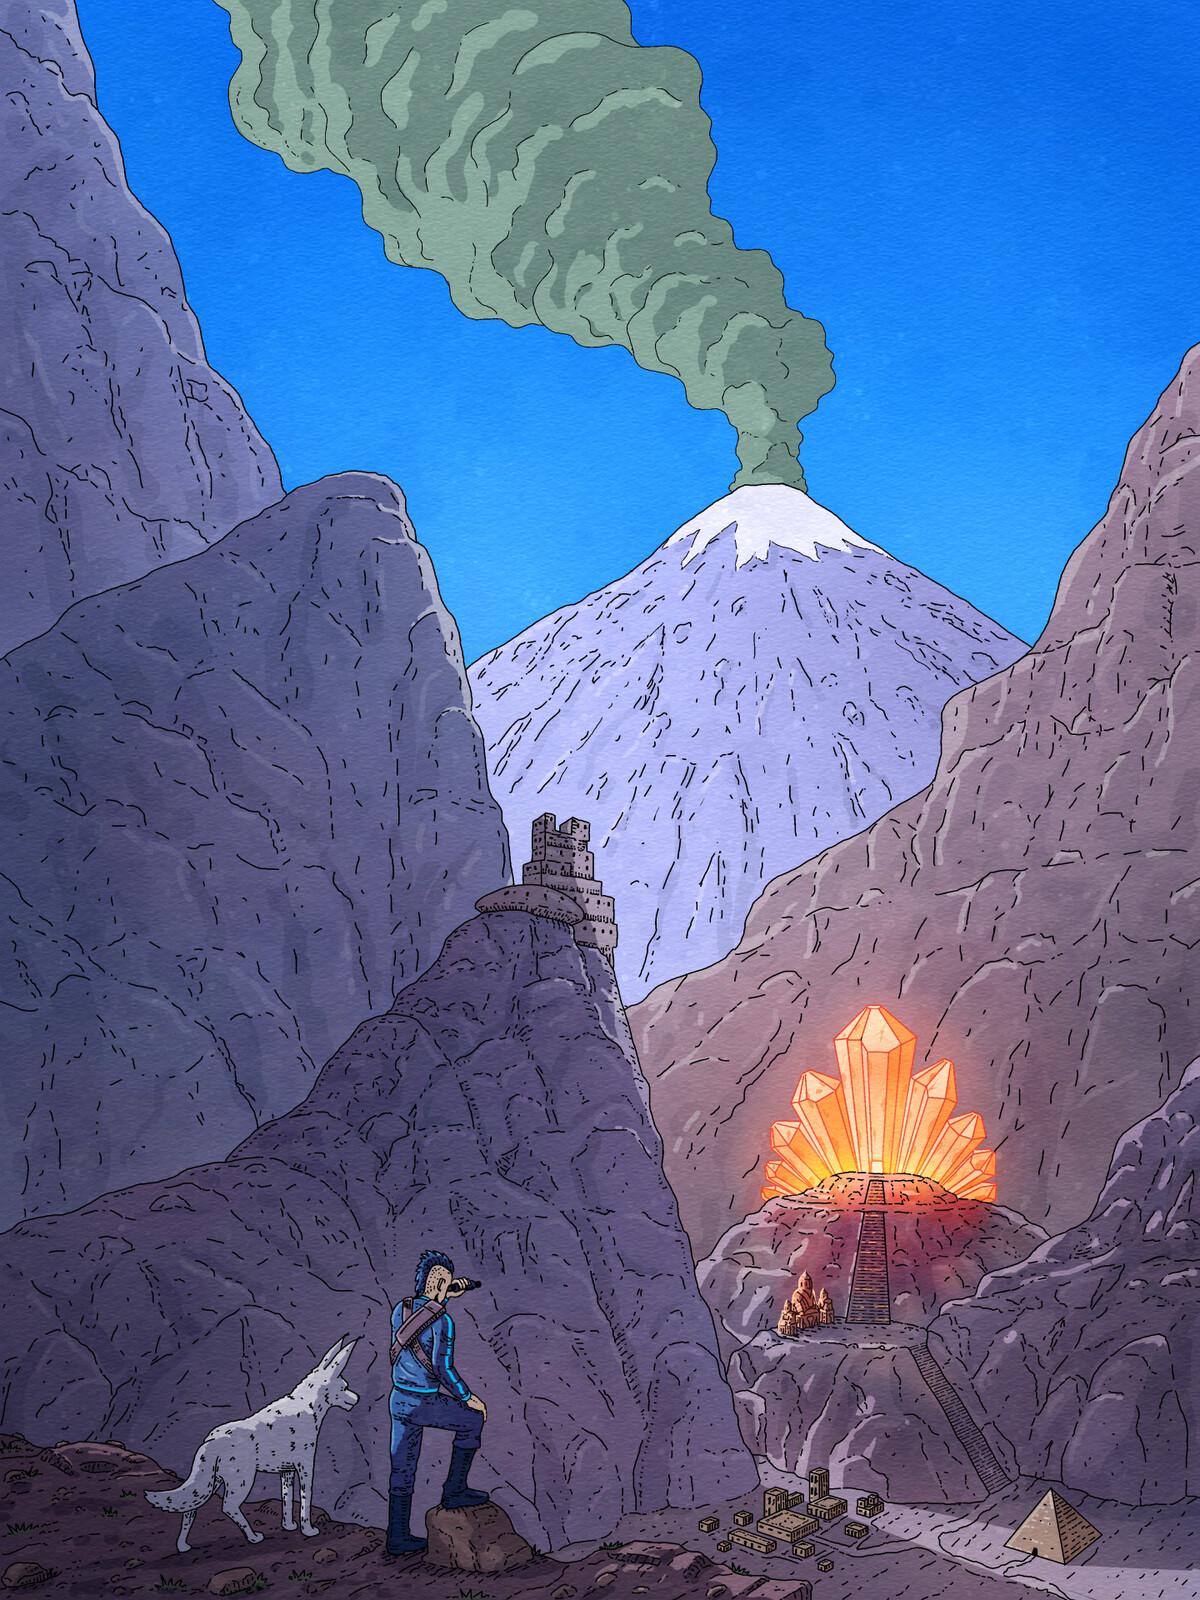 Sci-fi Illustration for graphic novel